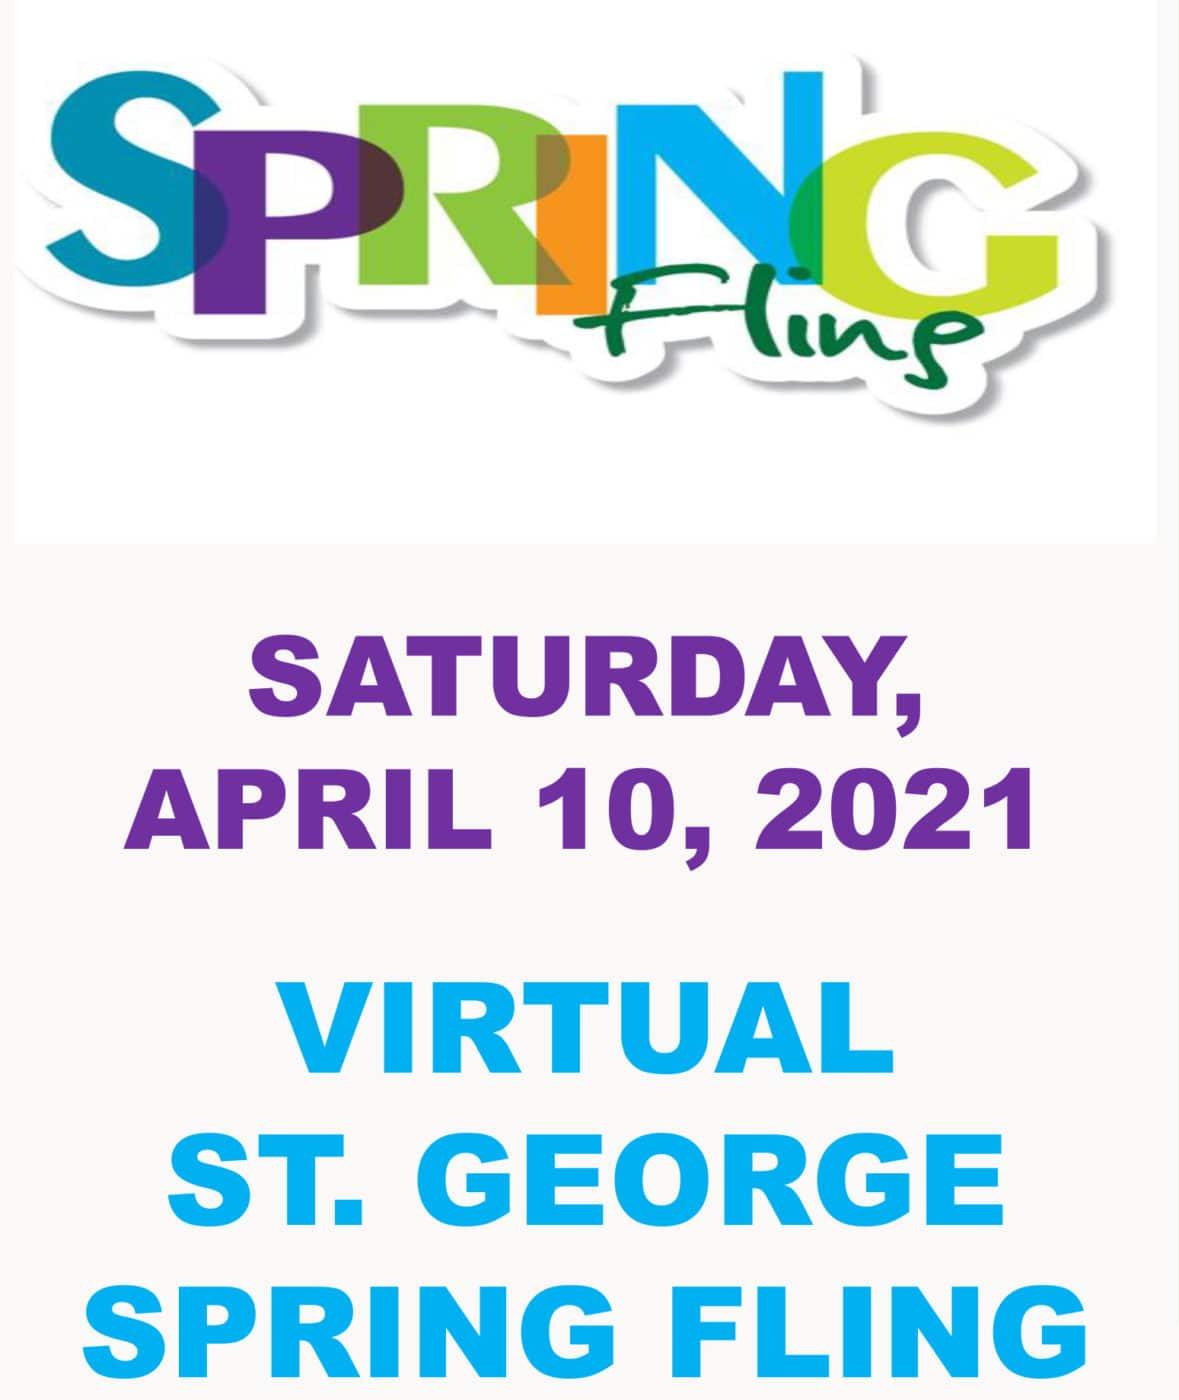 2021 Spring Fling Image